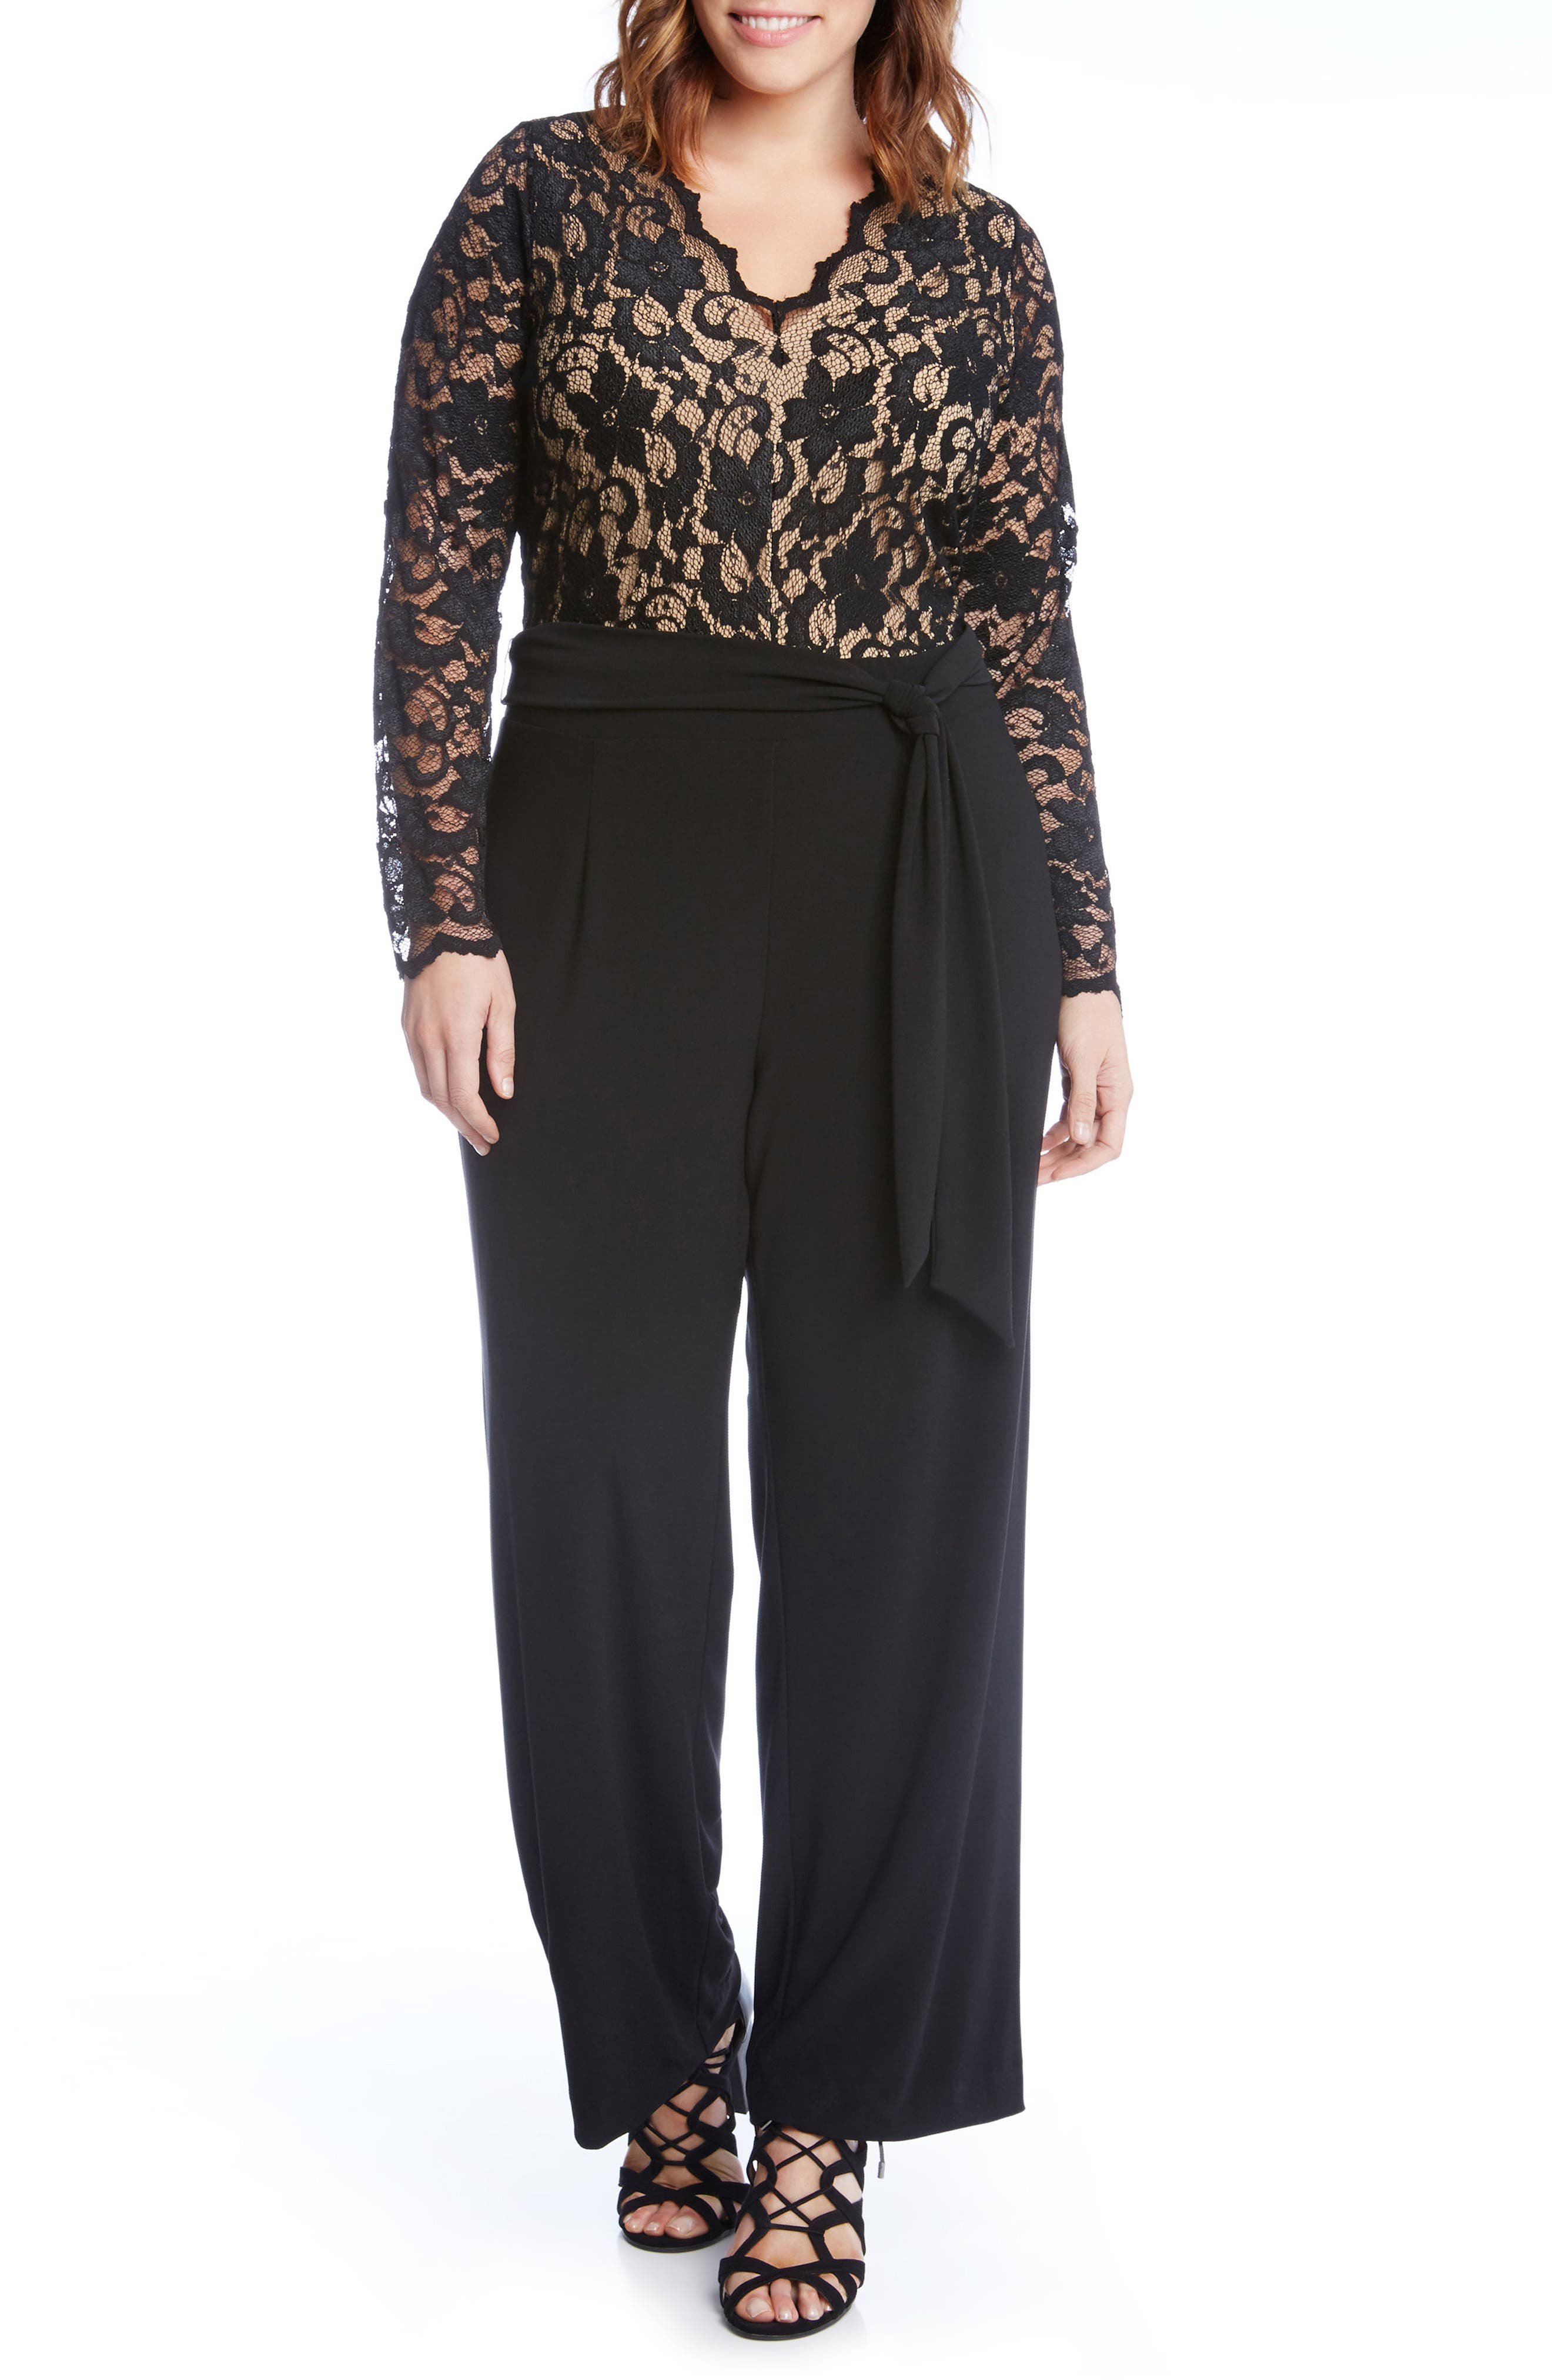 Alternate Image 1 Selected - Karen Kane Lace & Jersey Palazzo Jumpsuit (Plus Size)